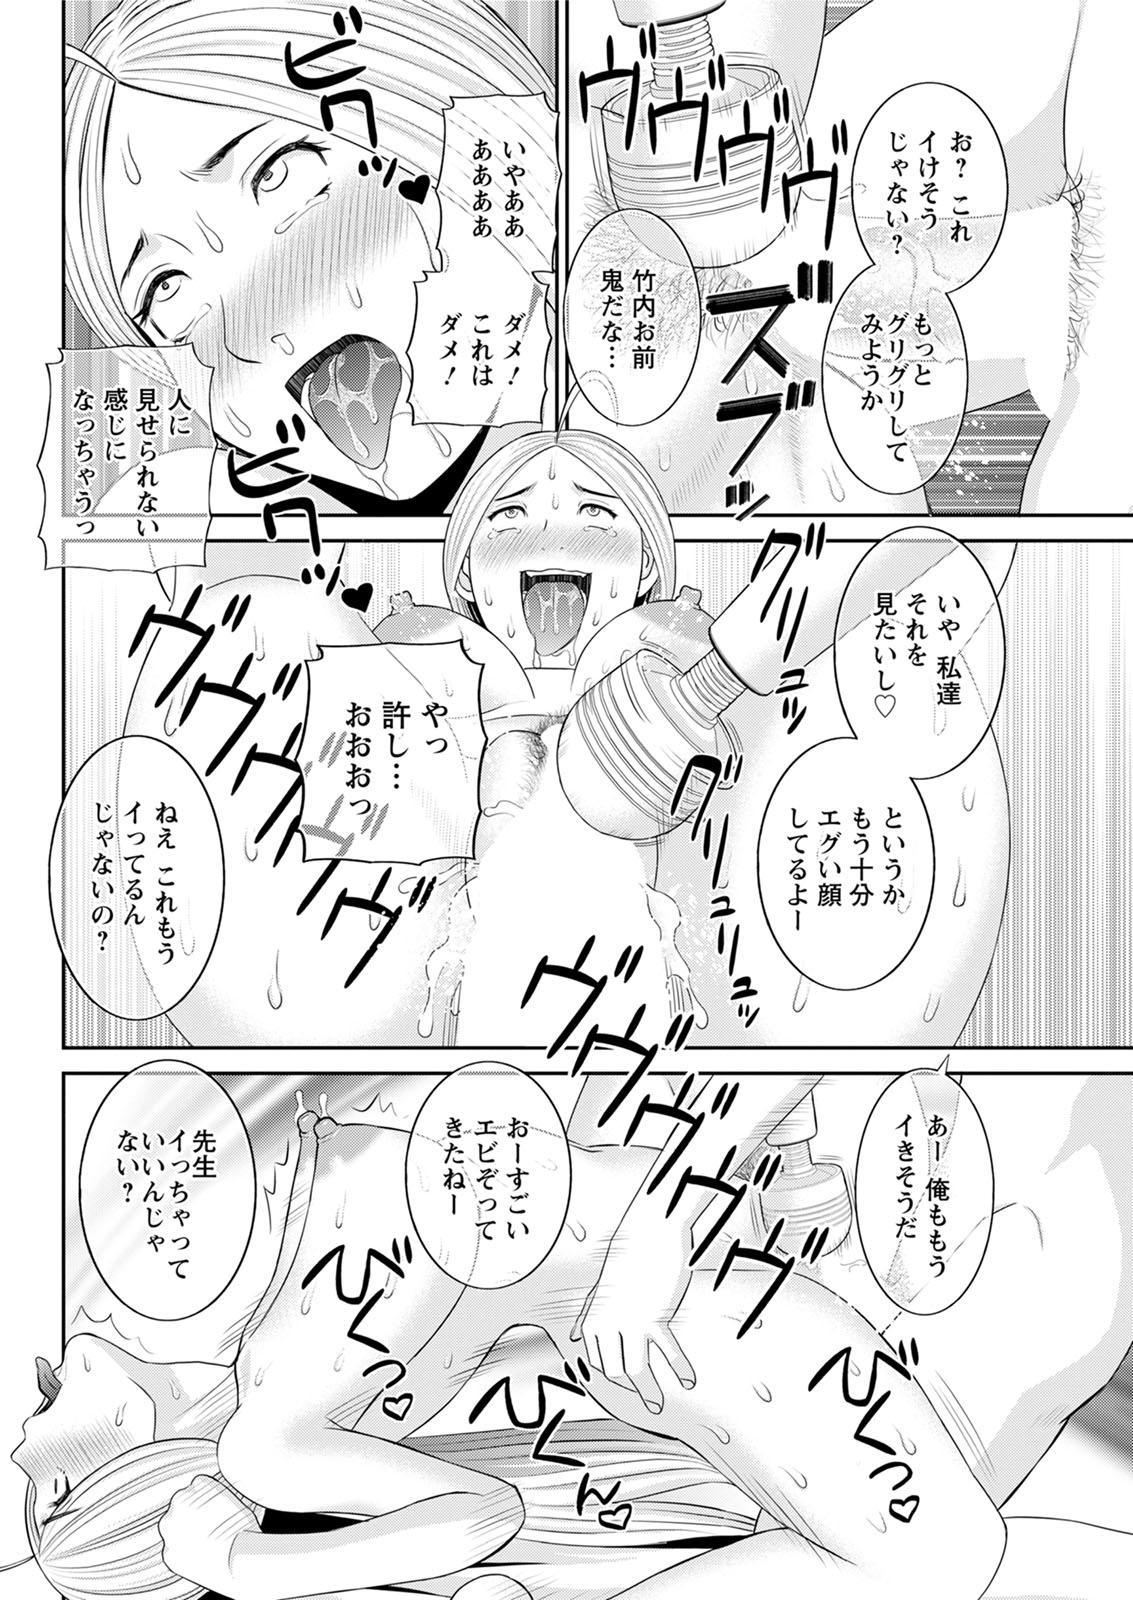 [Kawamori Misaki] Kaikan Hitotsuma Gakuen Ch. 1-6, 8-16 [Digital] 270